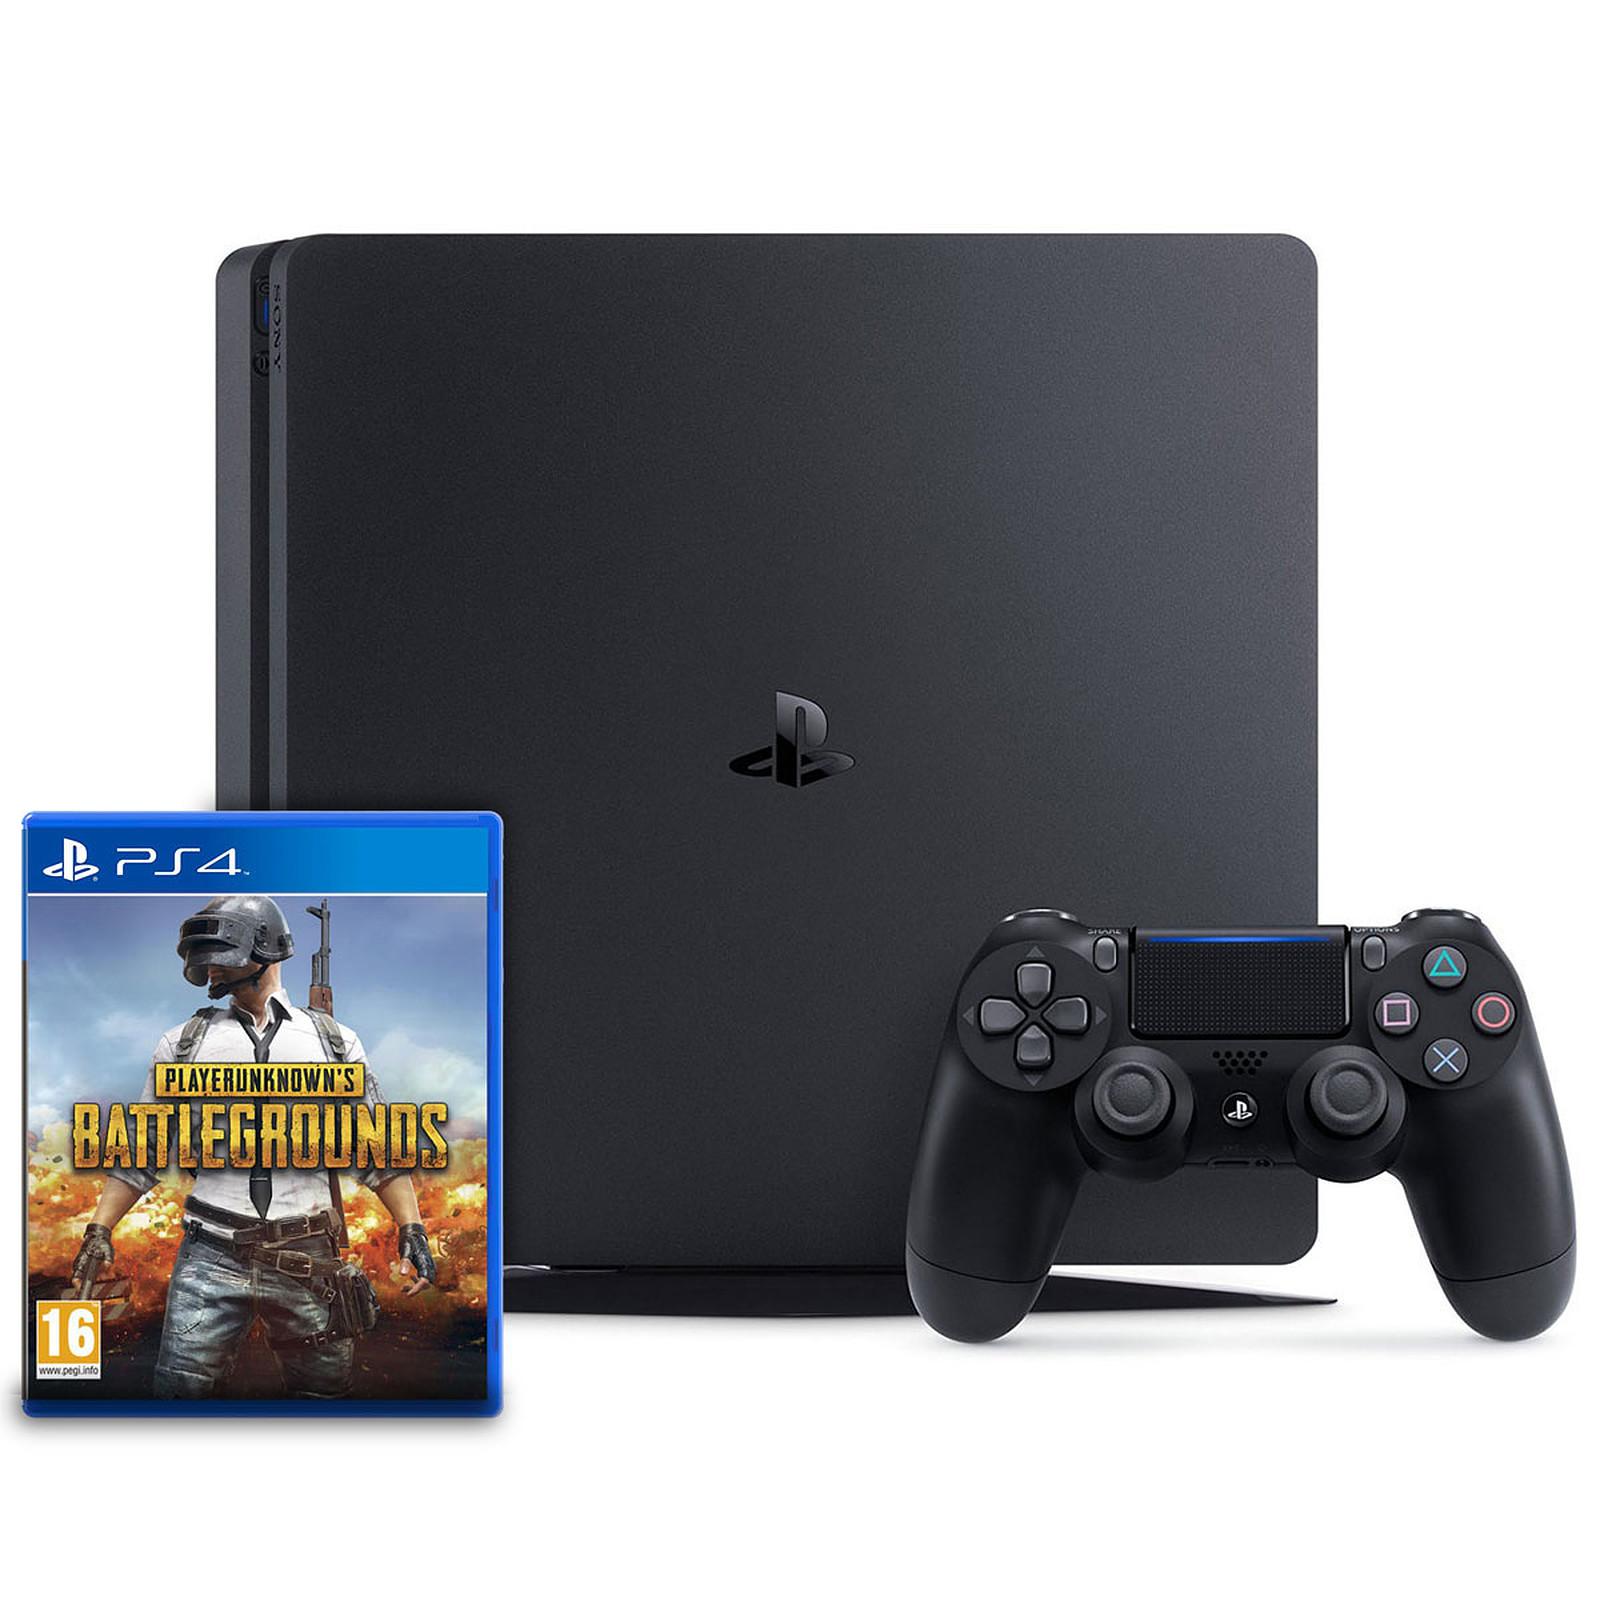 Sony PlayStation 4 Slim (500 Go) + PLAYERUNKNOWN'S BATTLEGROUNDS (PUBG)